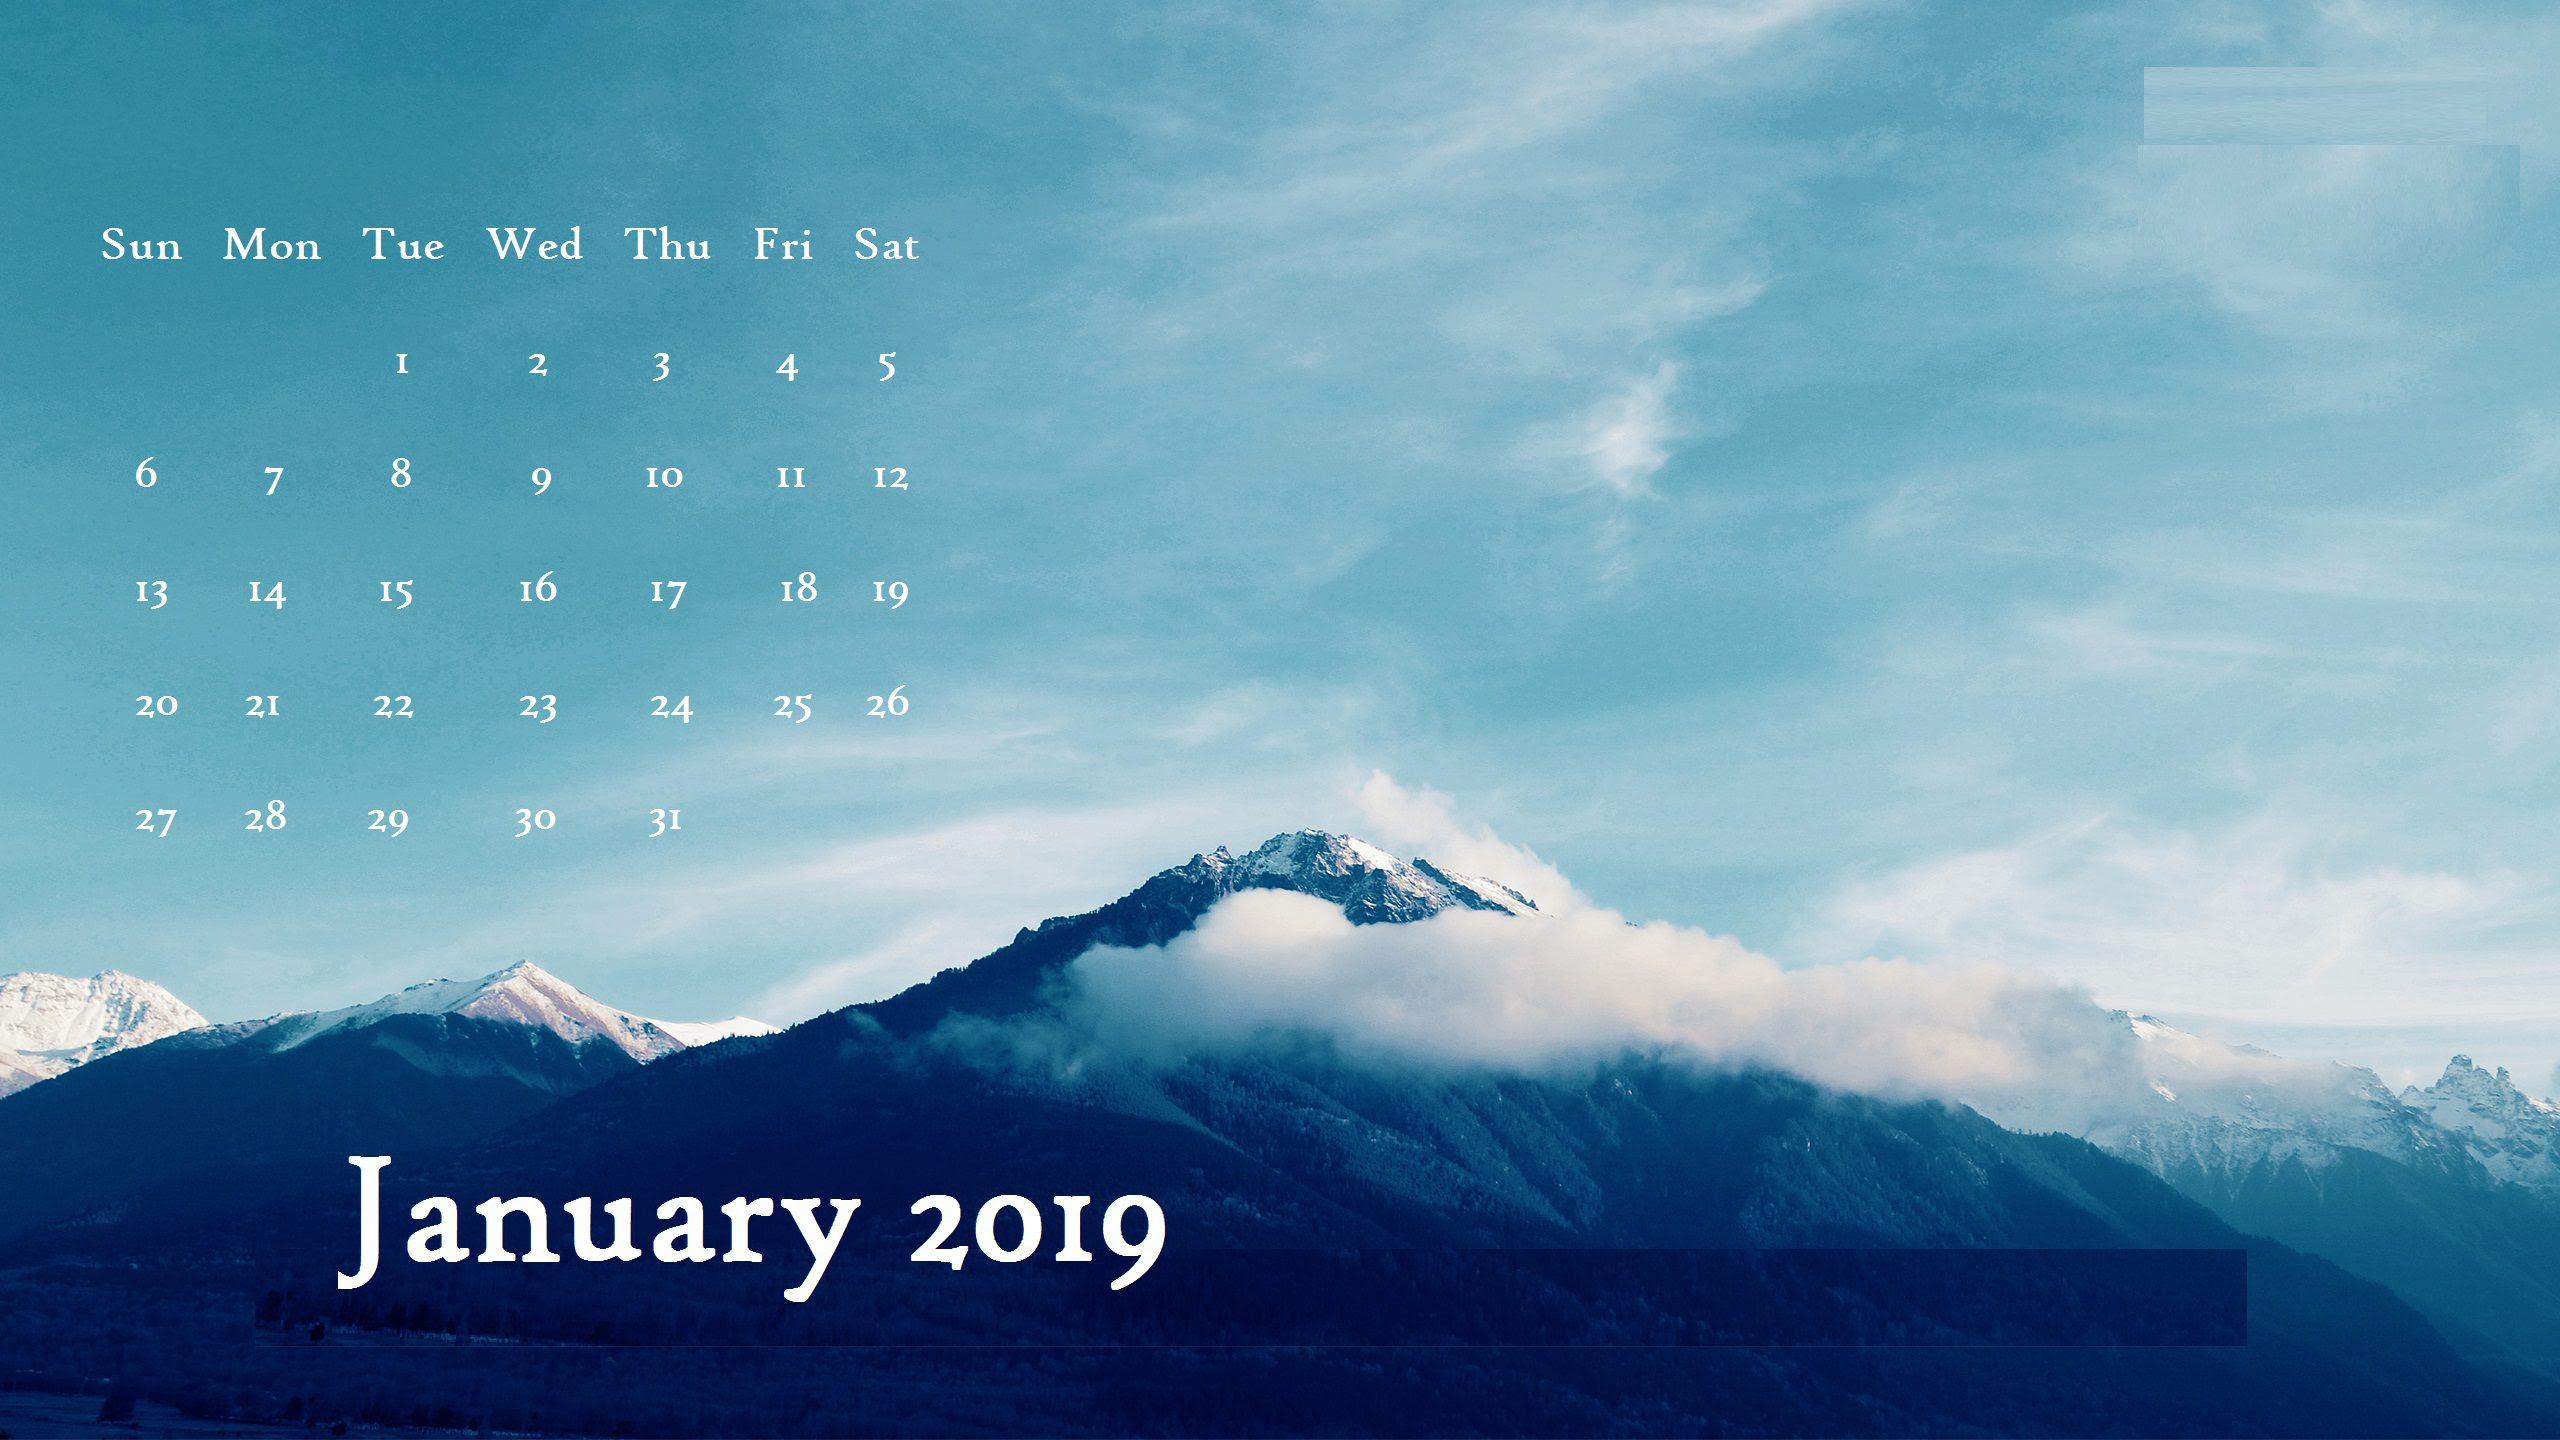 January 2019 Desktop Calendar Wallpaper